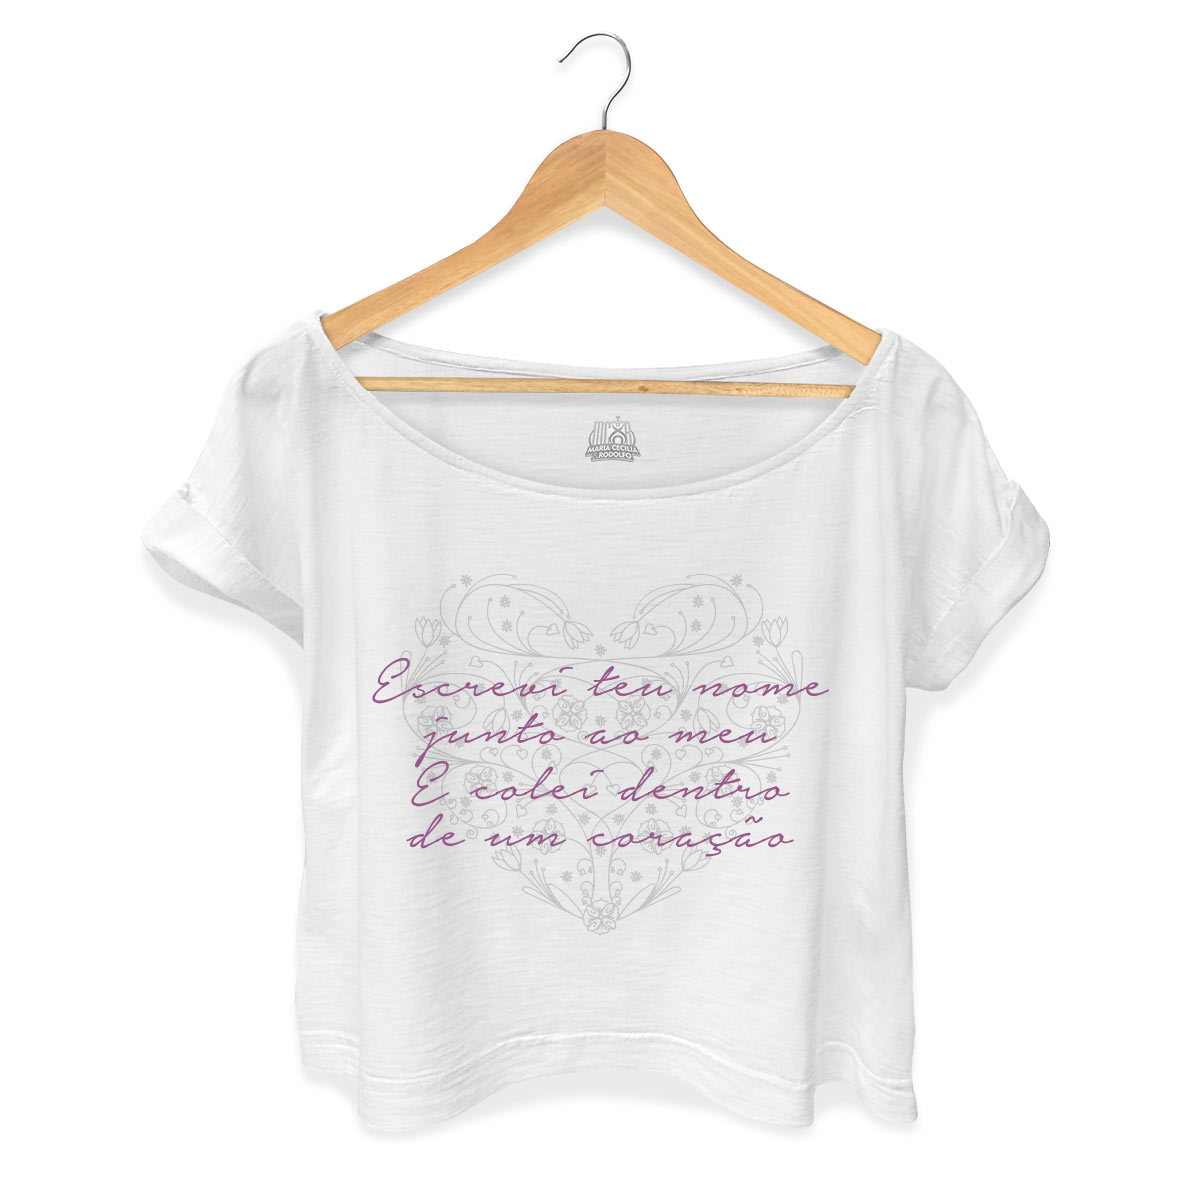 T-shirt Premium Feminina Maria Cecília & Rodolfo Escrevi Teu Nome